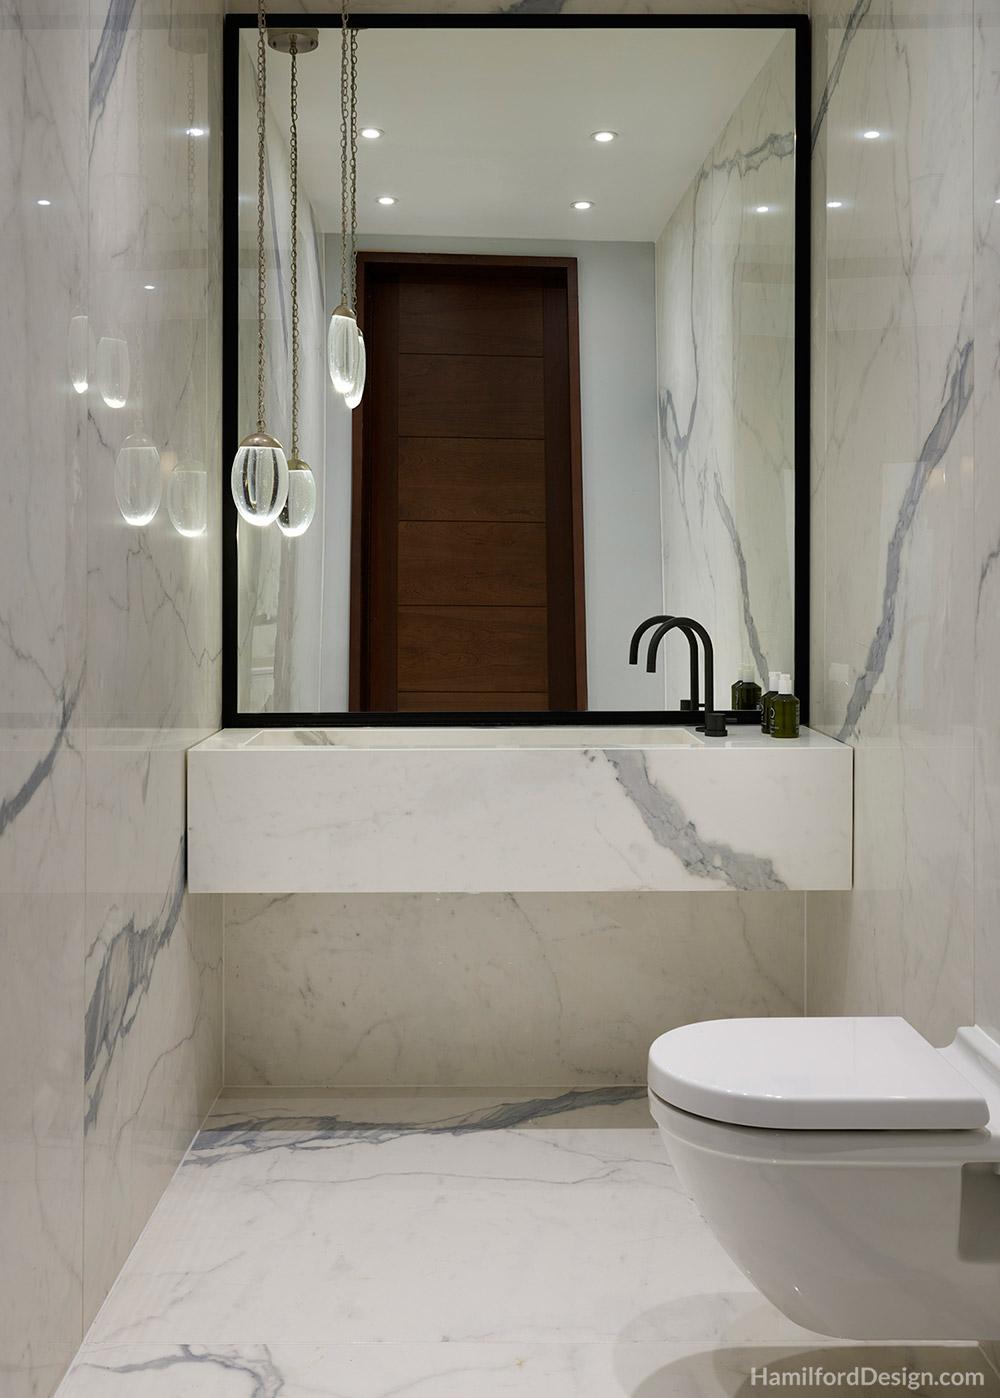 The Lakes Bathrooms Ensuites cloakrooms  Tiles  Baths